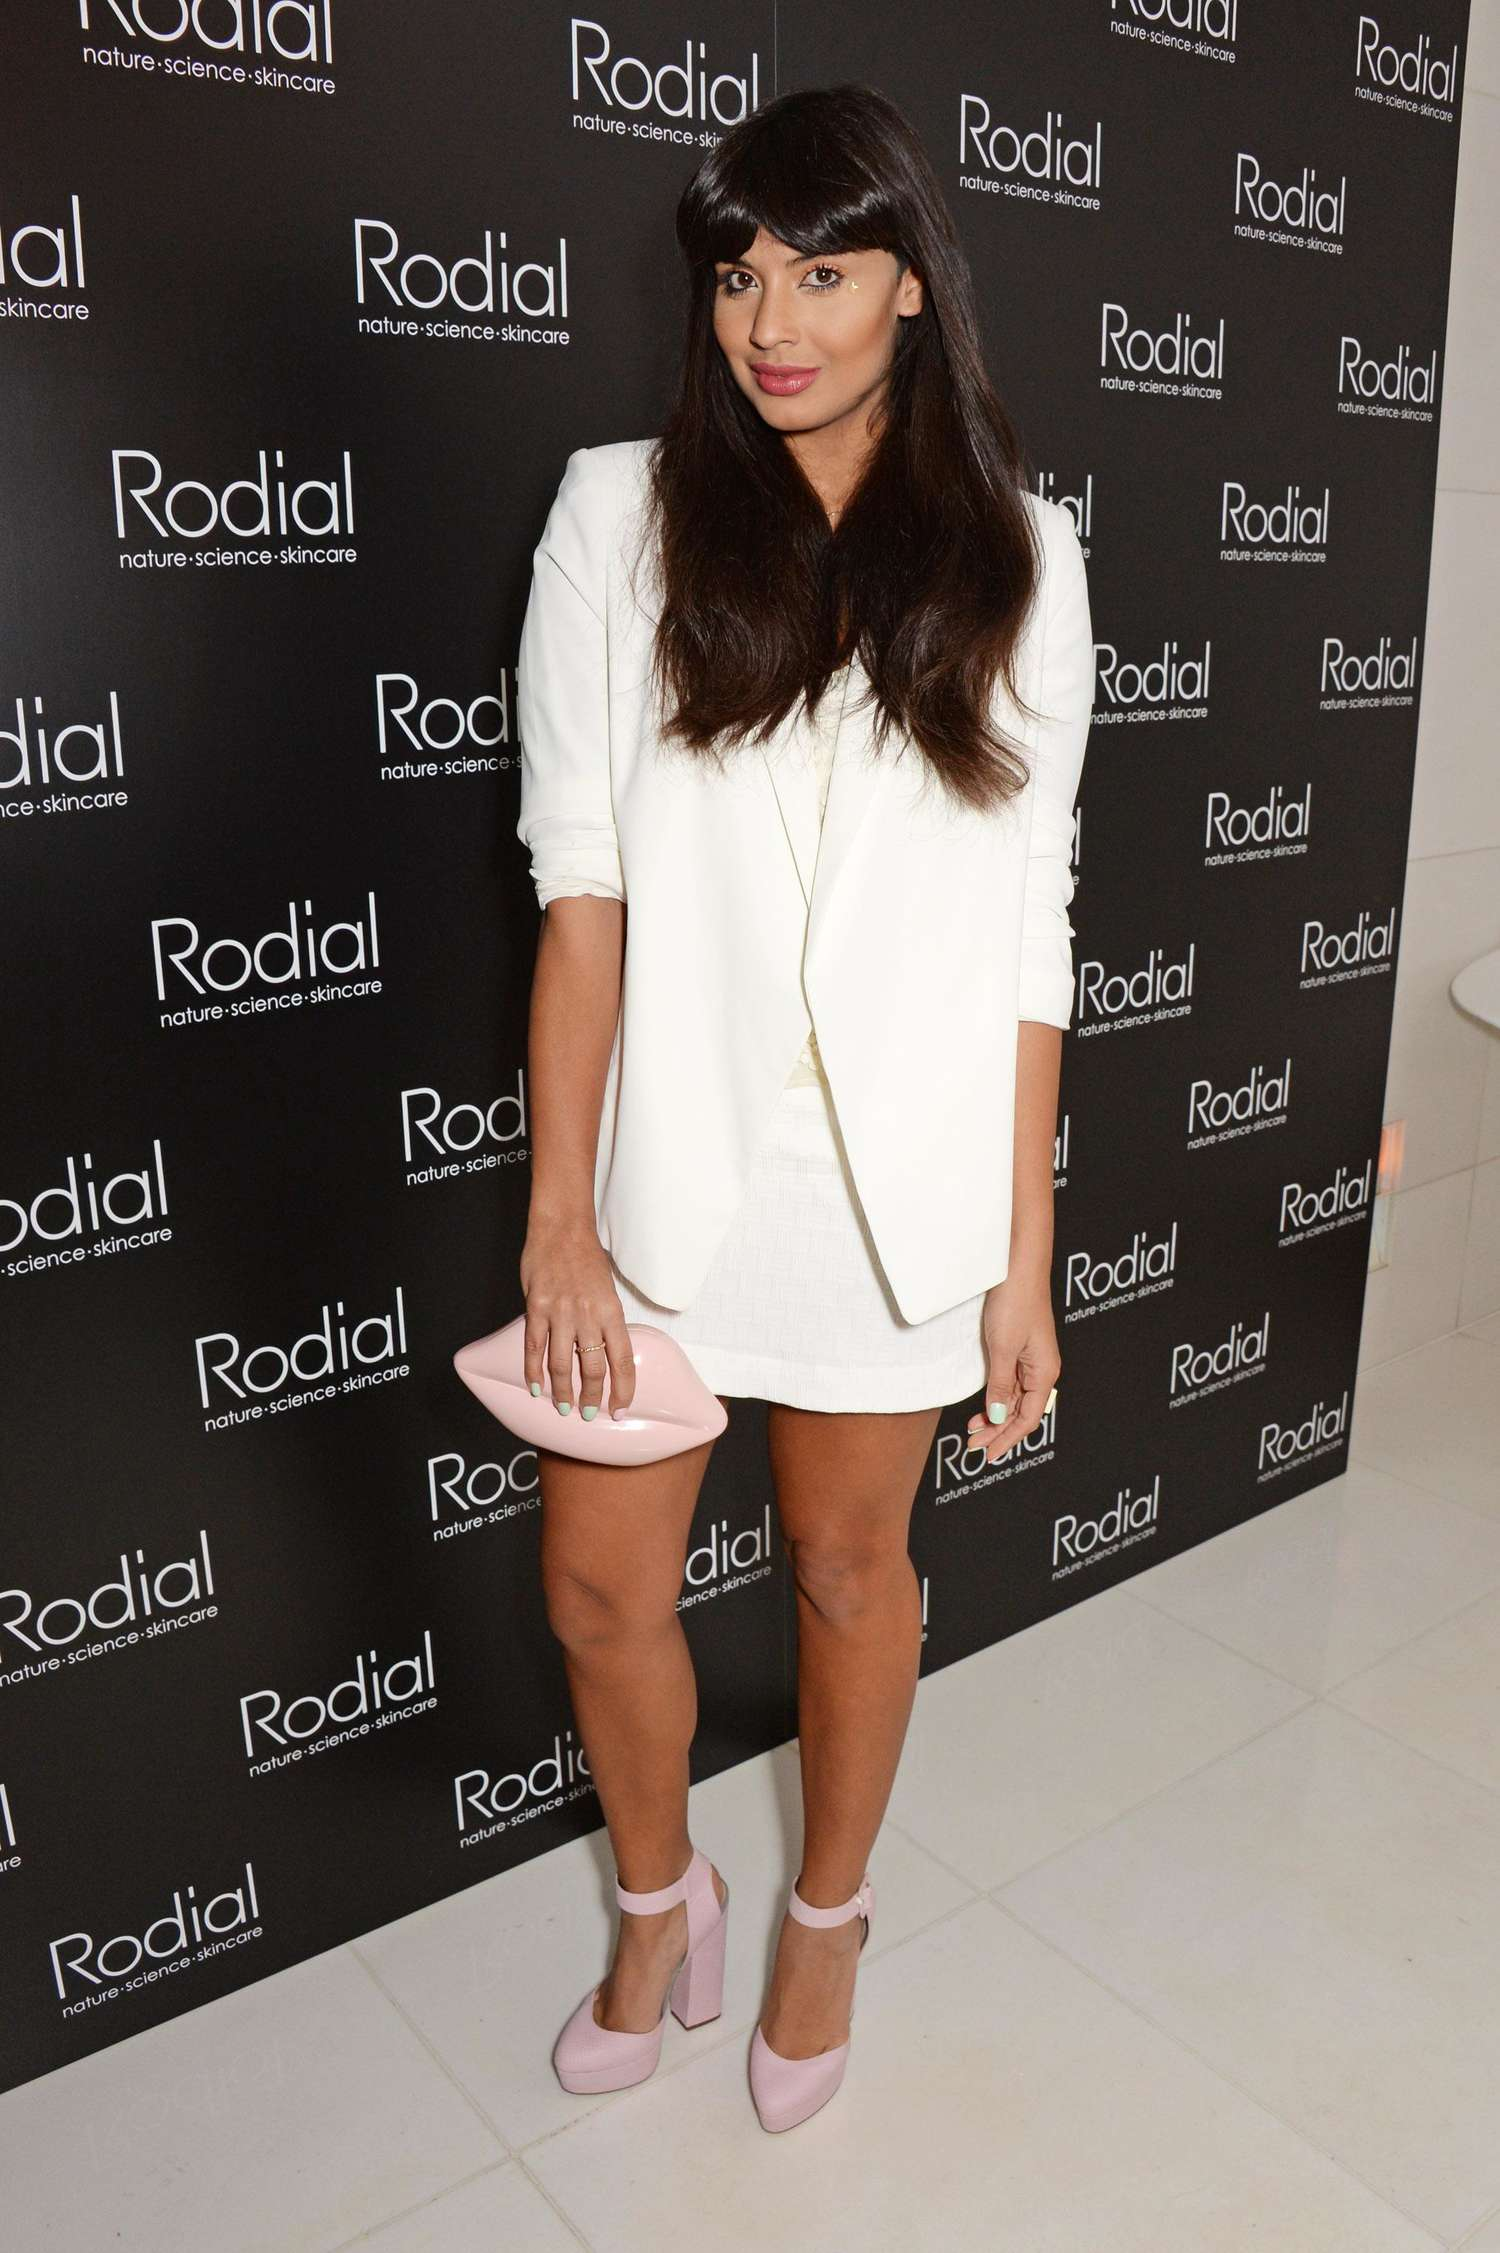 Jameela Jamil 2014 Rodial Beauty Awards 02 GotCeleb